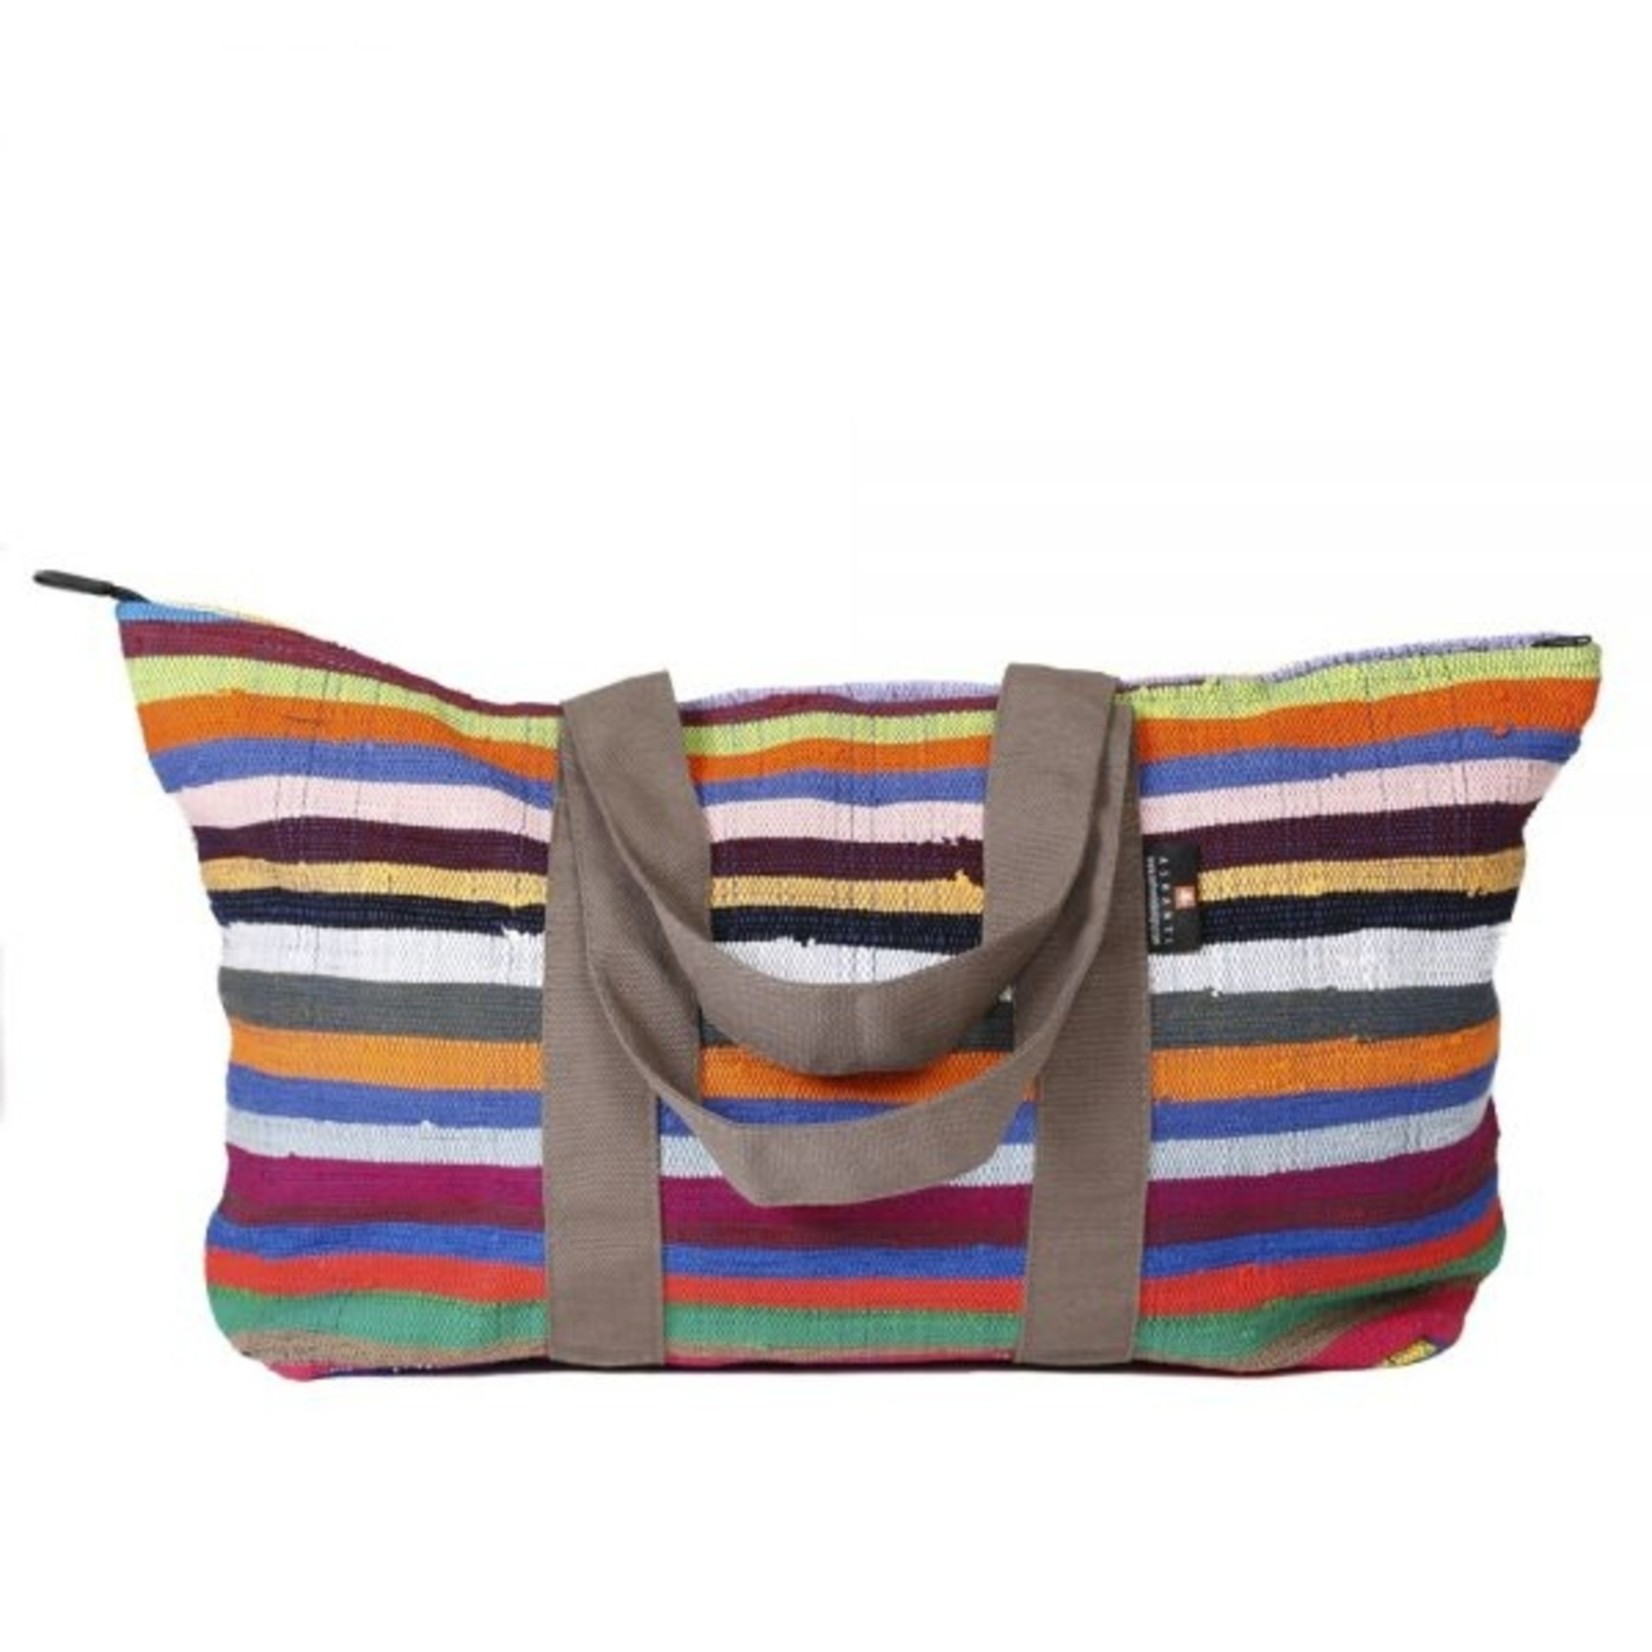 Ashanti design Amataba bag